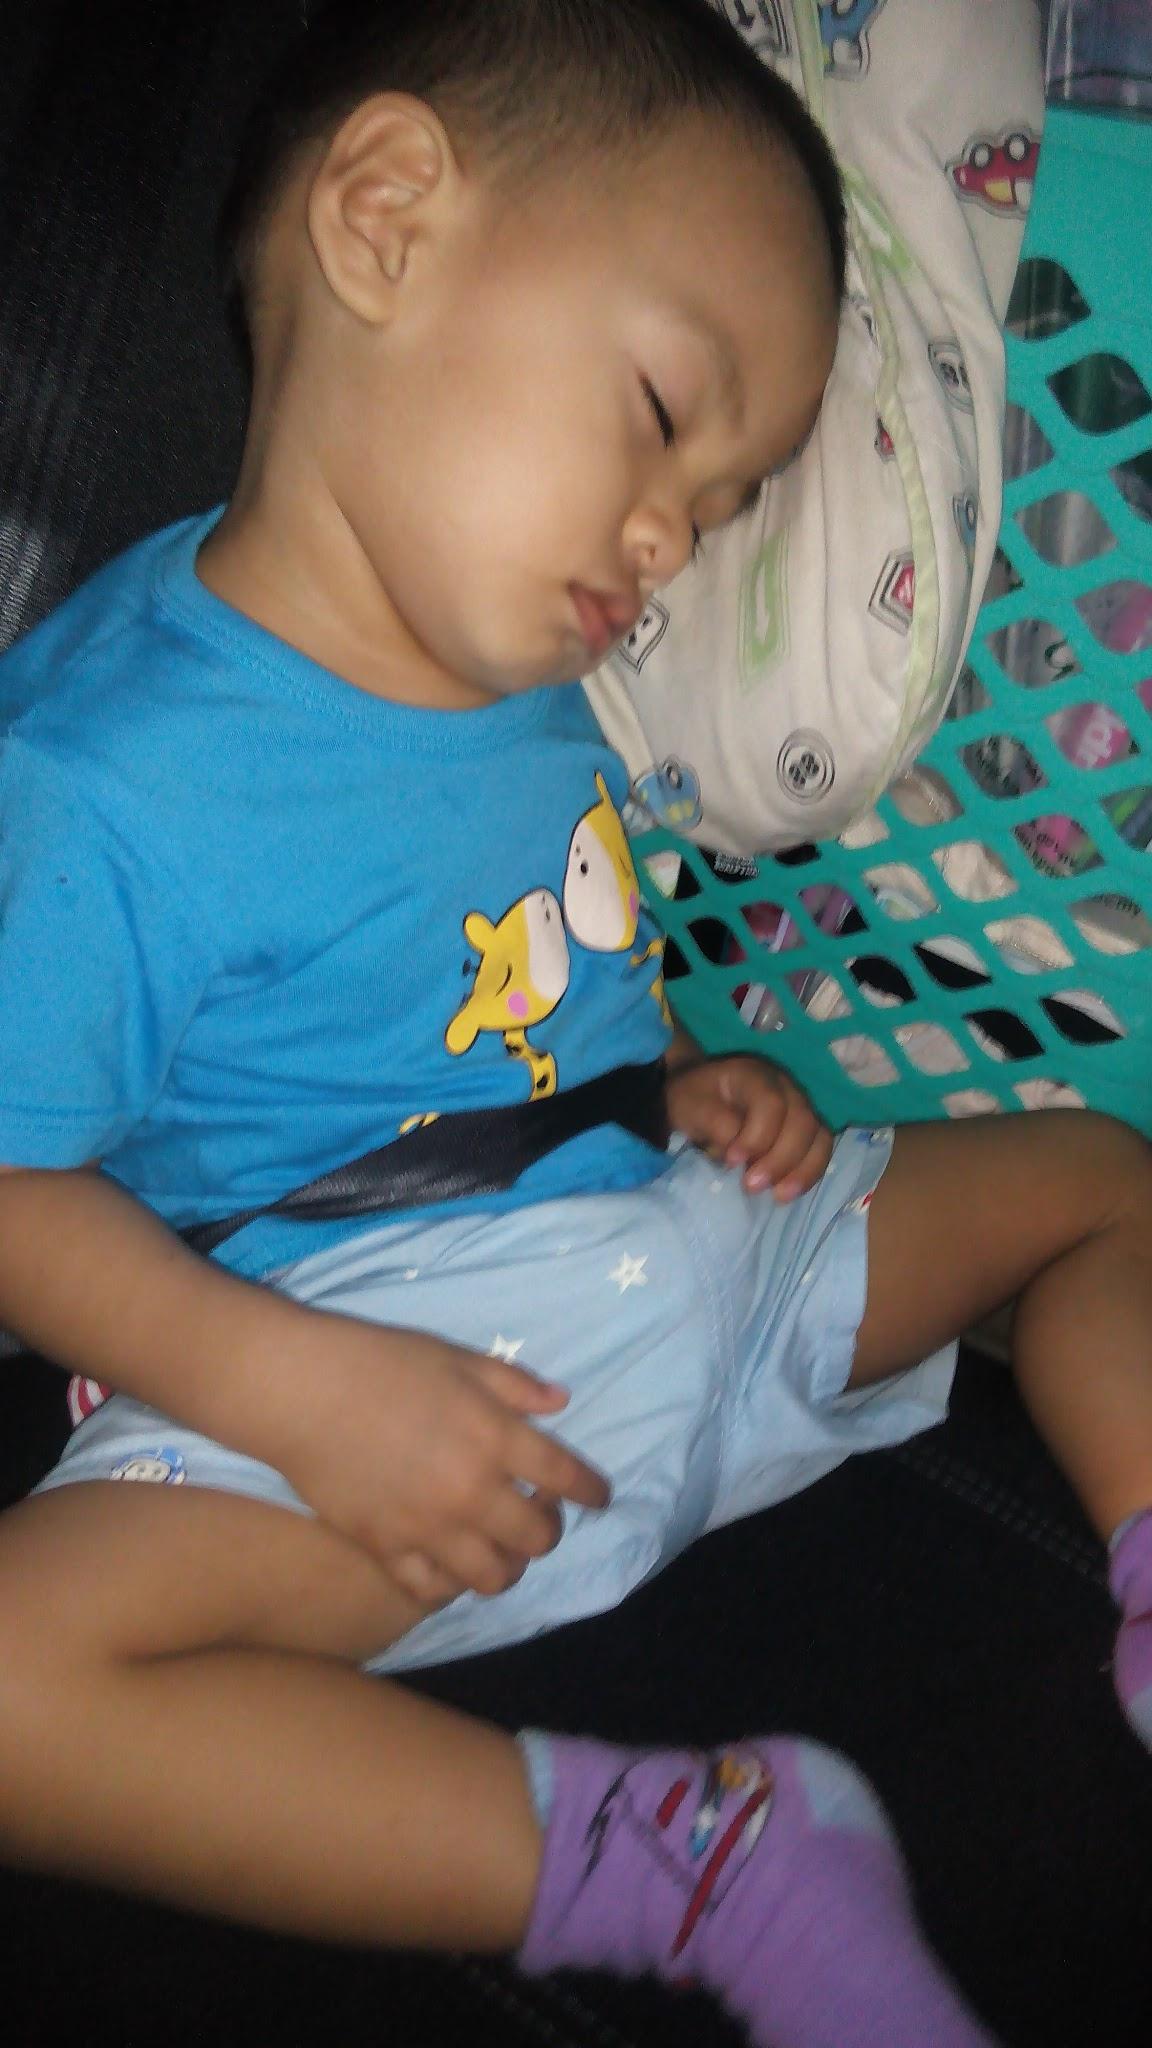 Latihan Penggunaan Safety Belt Untuk Anak